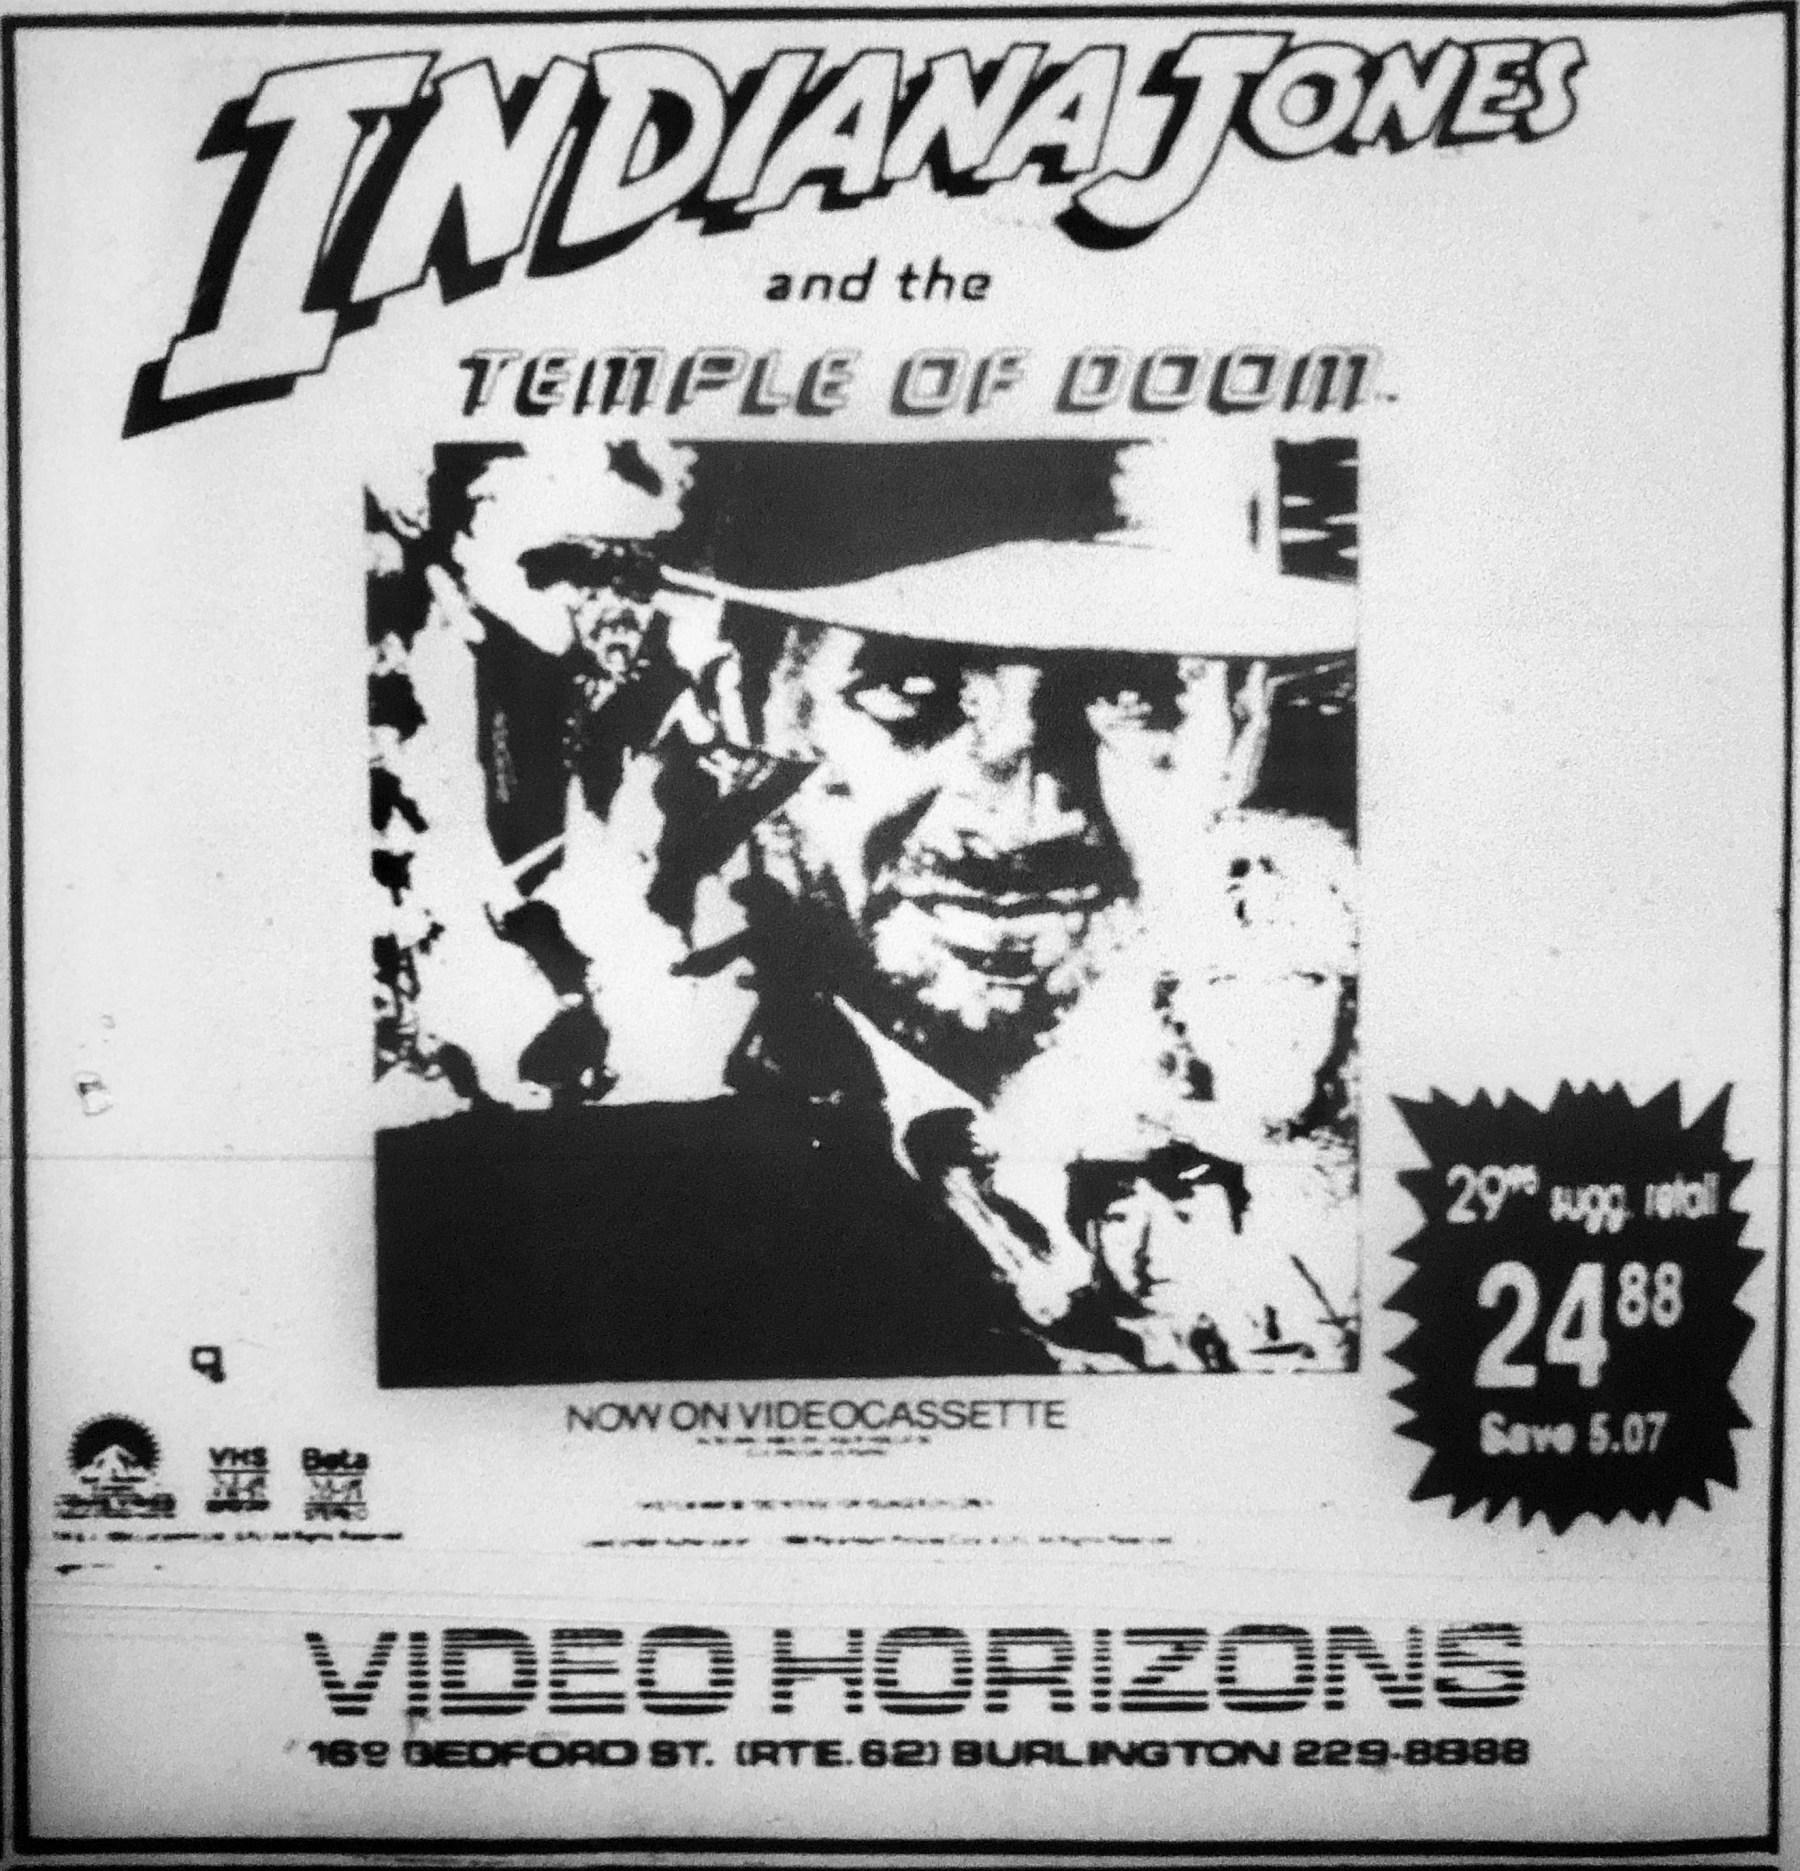 Video Horizons, Burlington MA